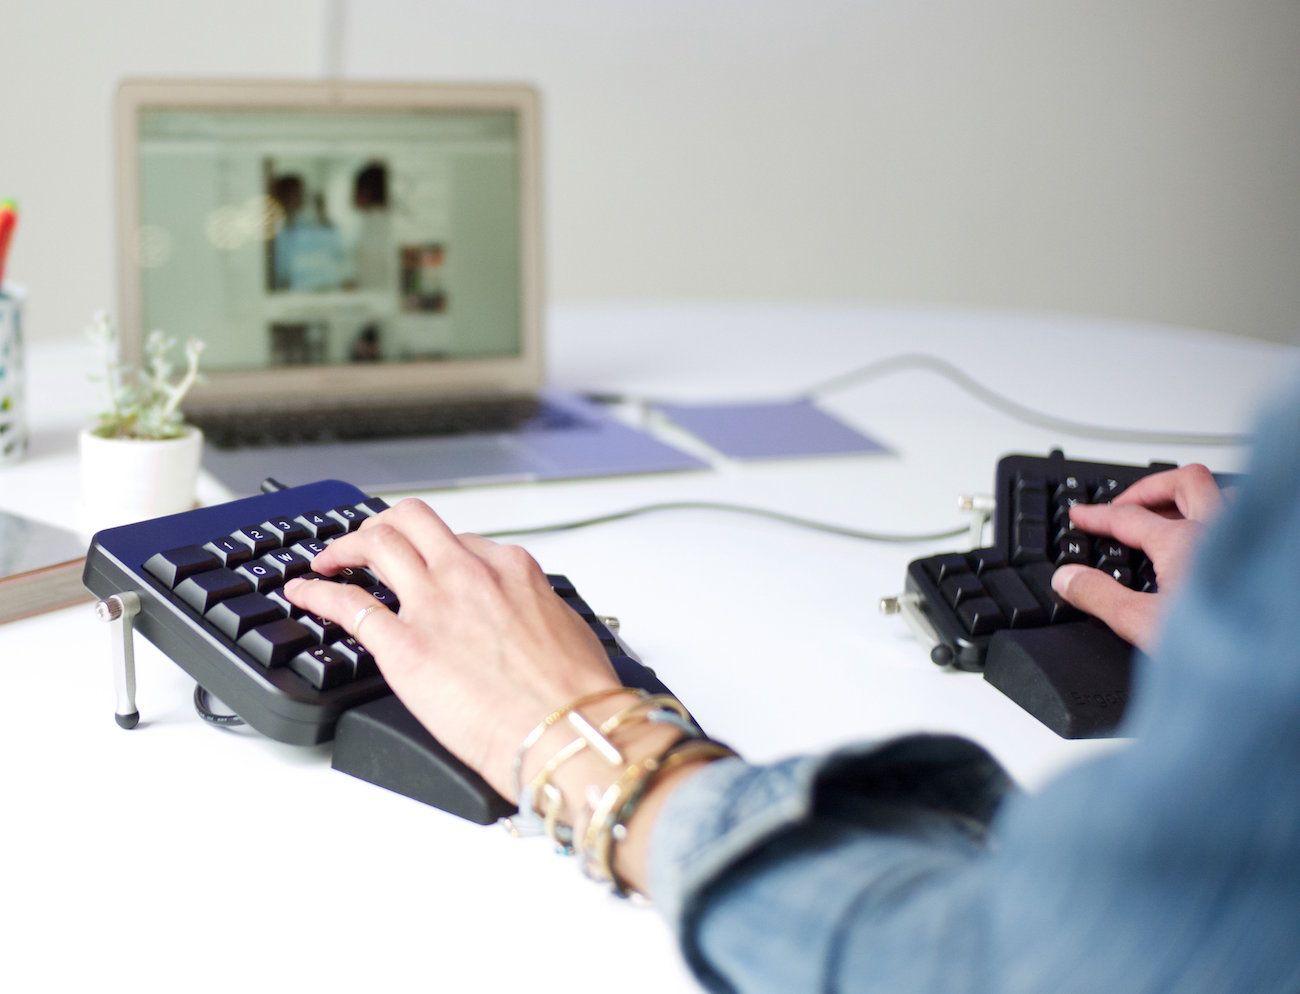 ErgoDox EZ Ergonomic Mechanical Keyboard